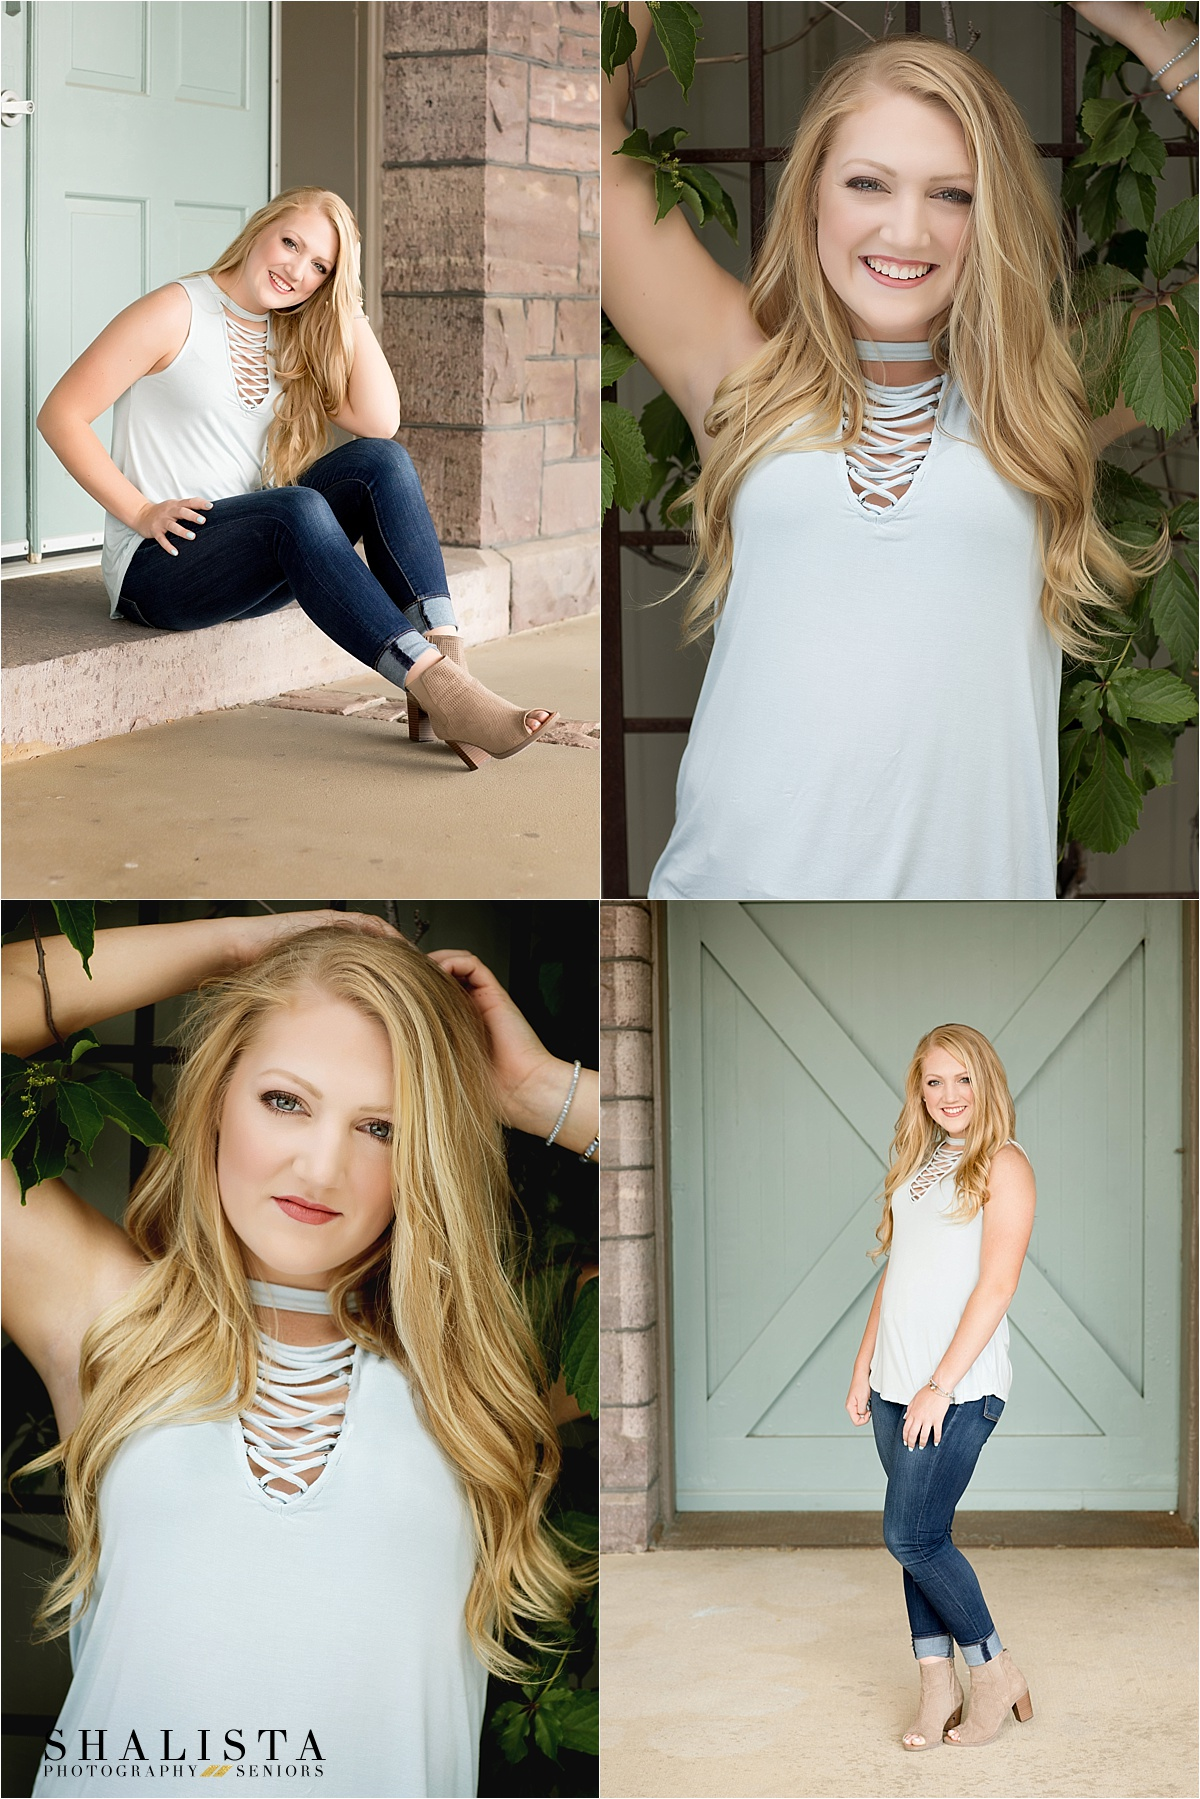 Urban senior girl by mint doors, long blonde hair